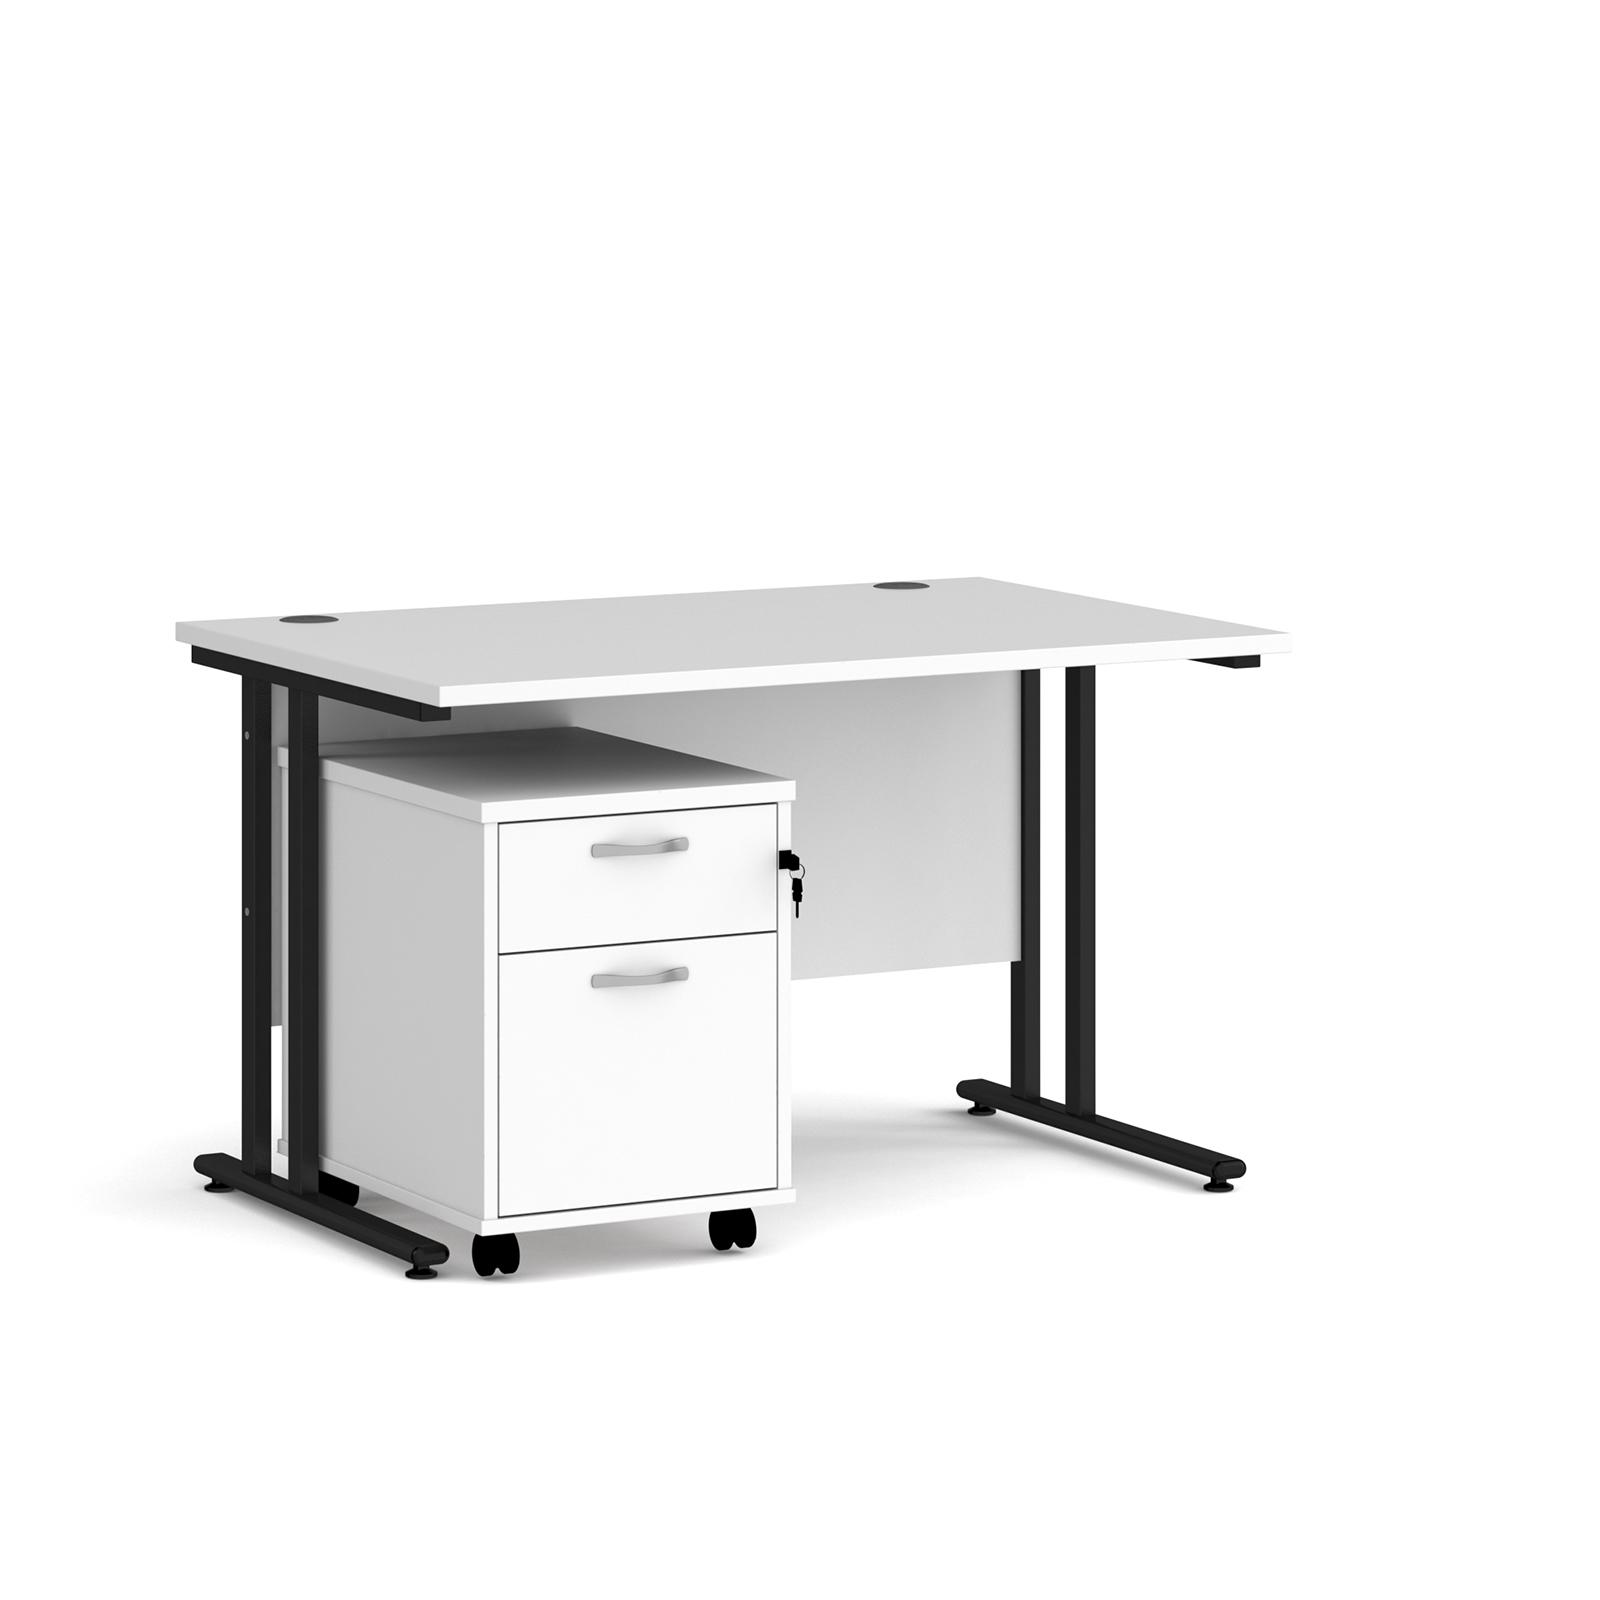 Rectangular Desks Maestro 25 straight desk 1200mm x 800mm with black cantilever frame and 2 drawer pedestal - white